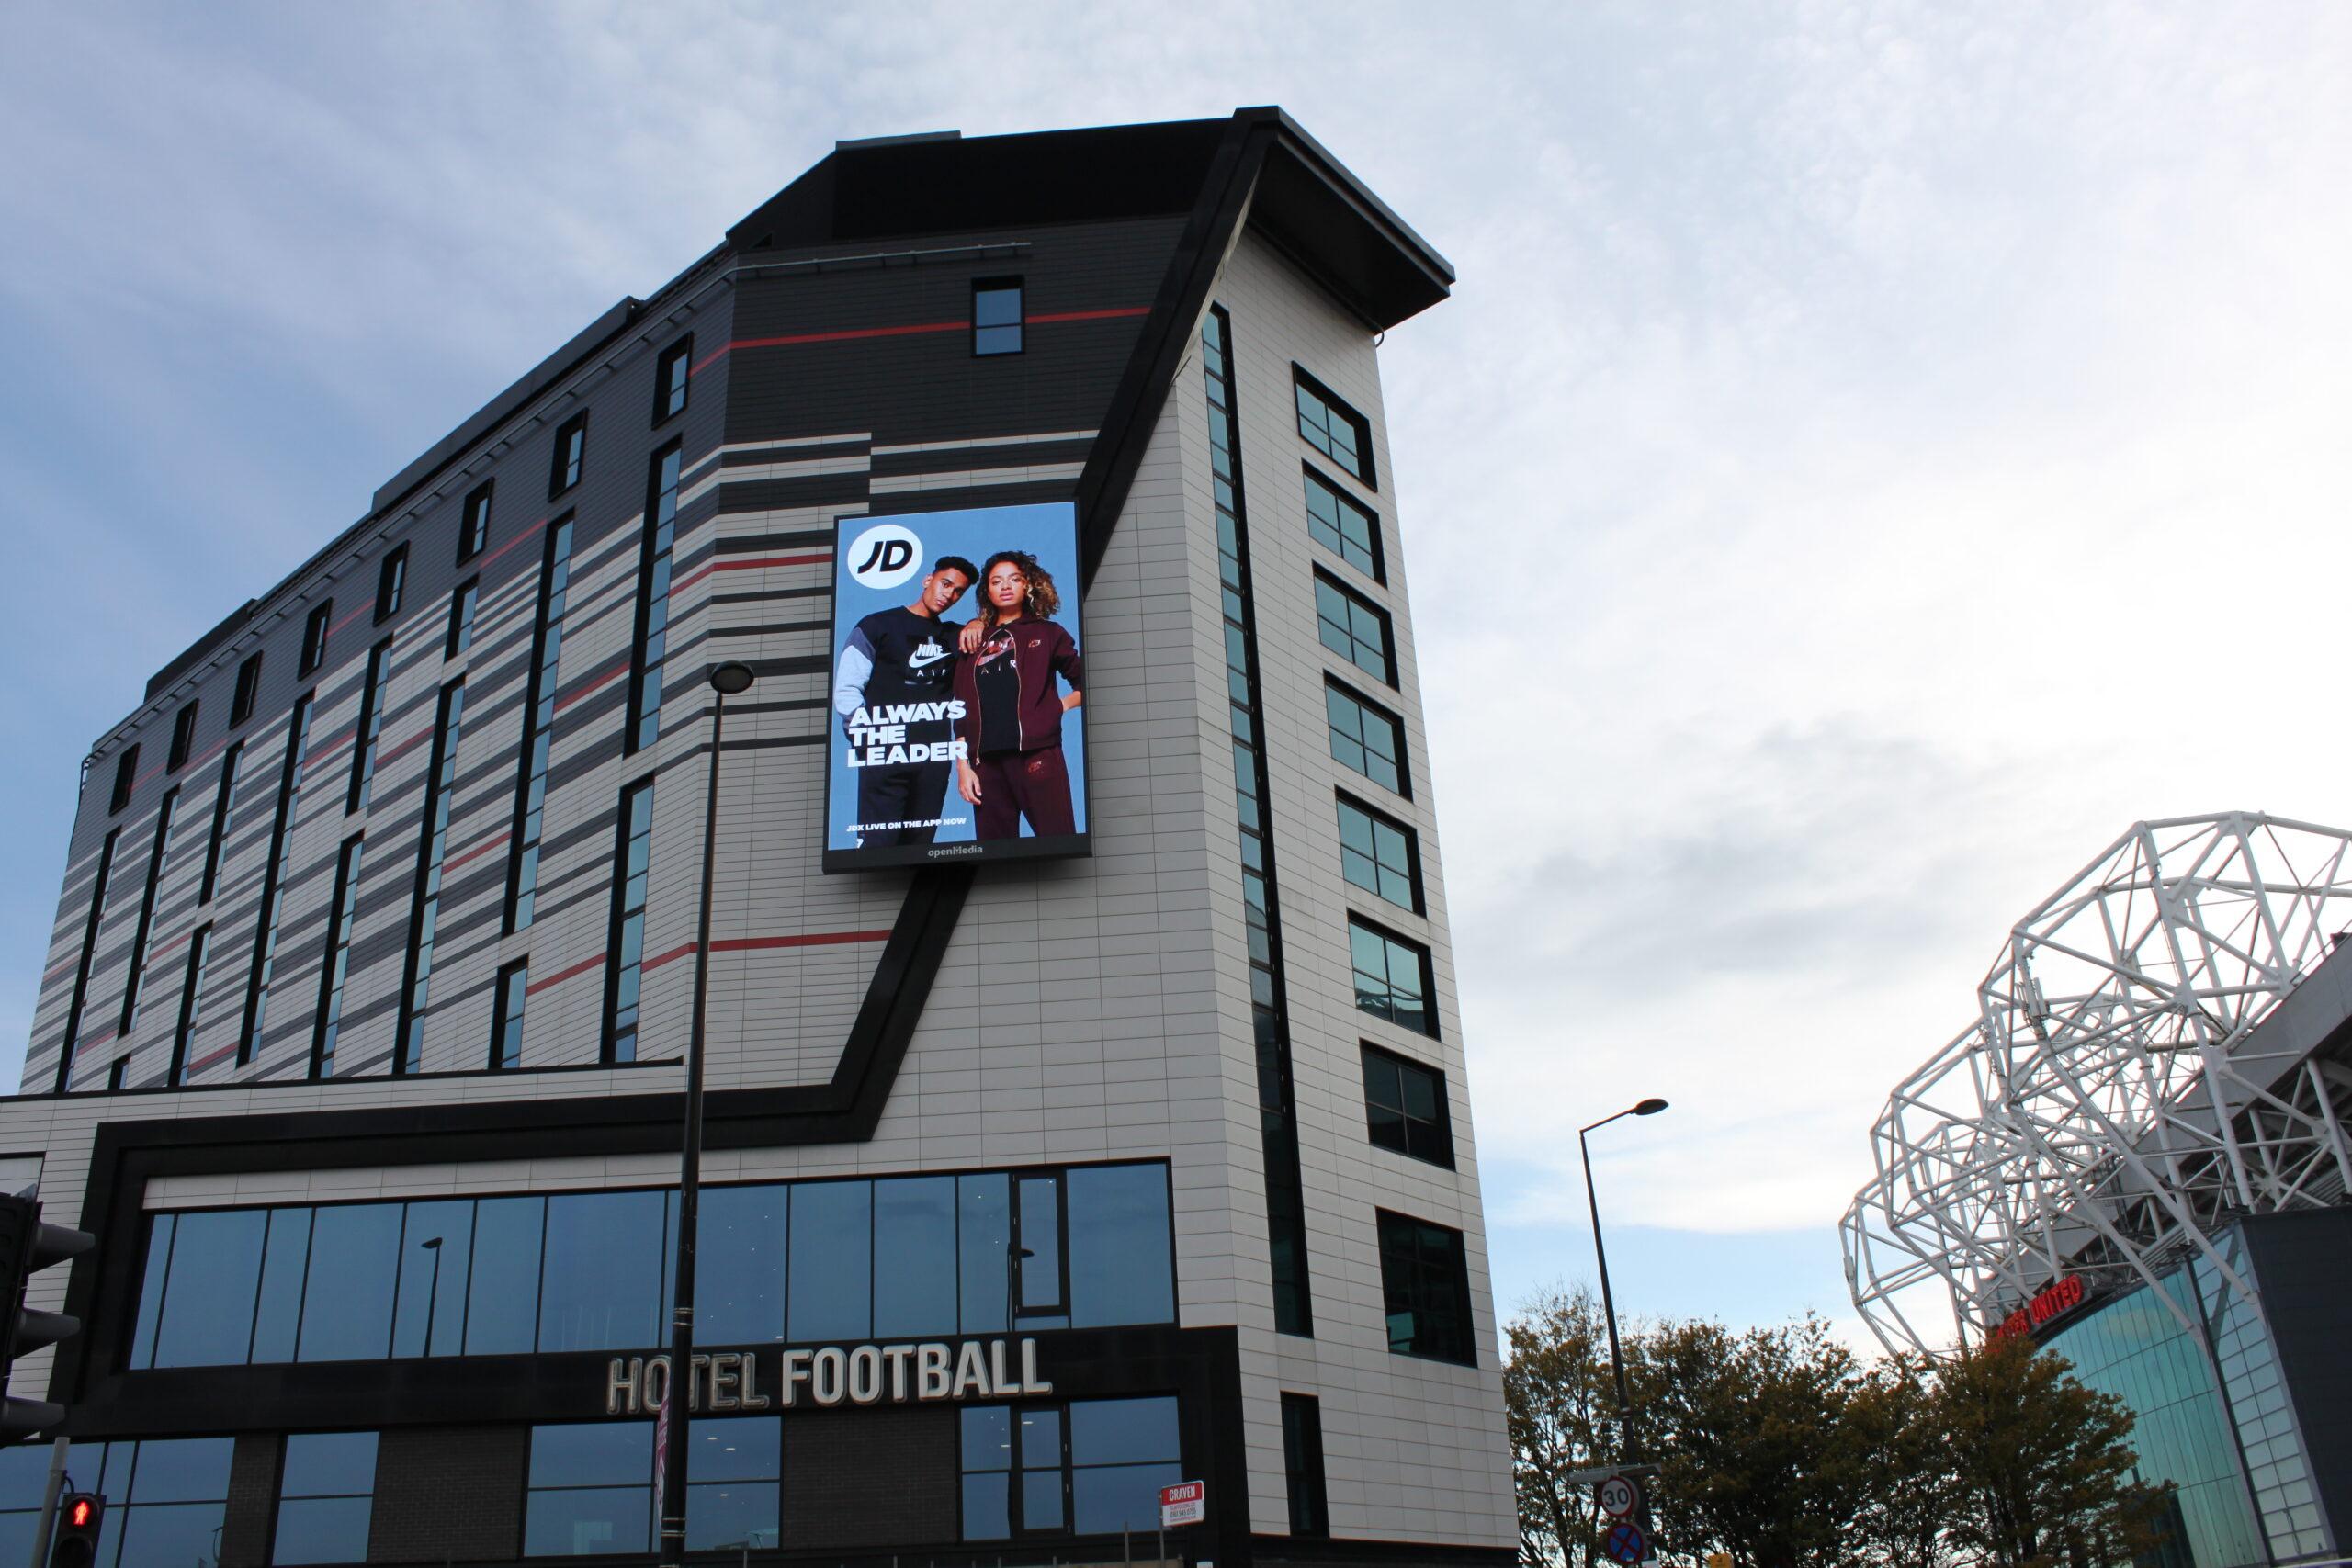 Hotel-Football-1